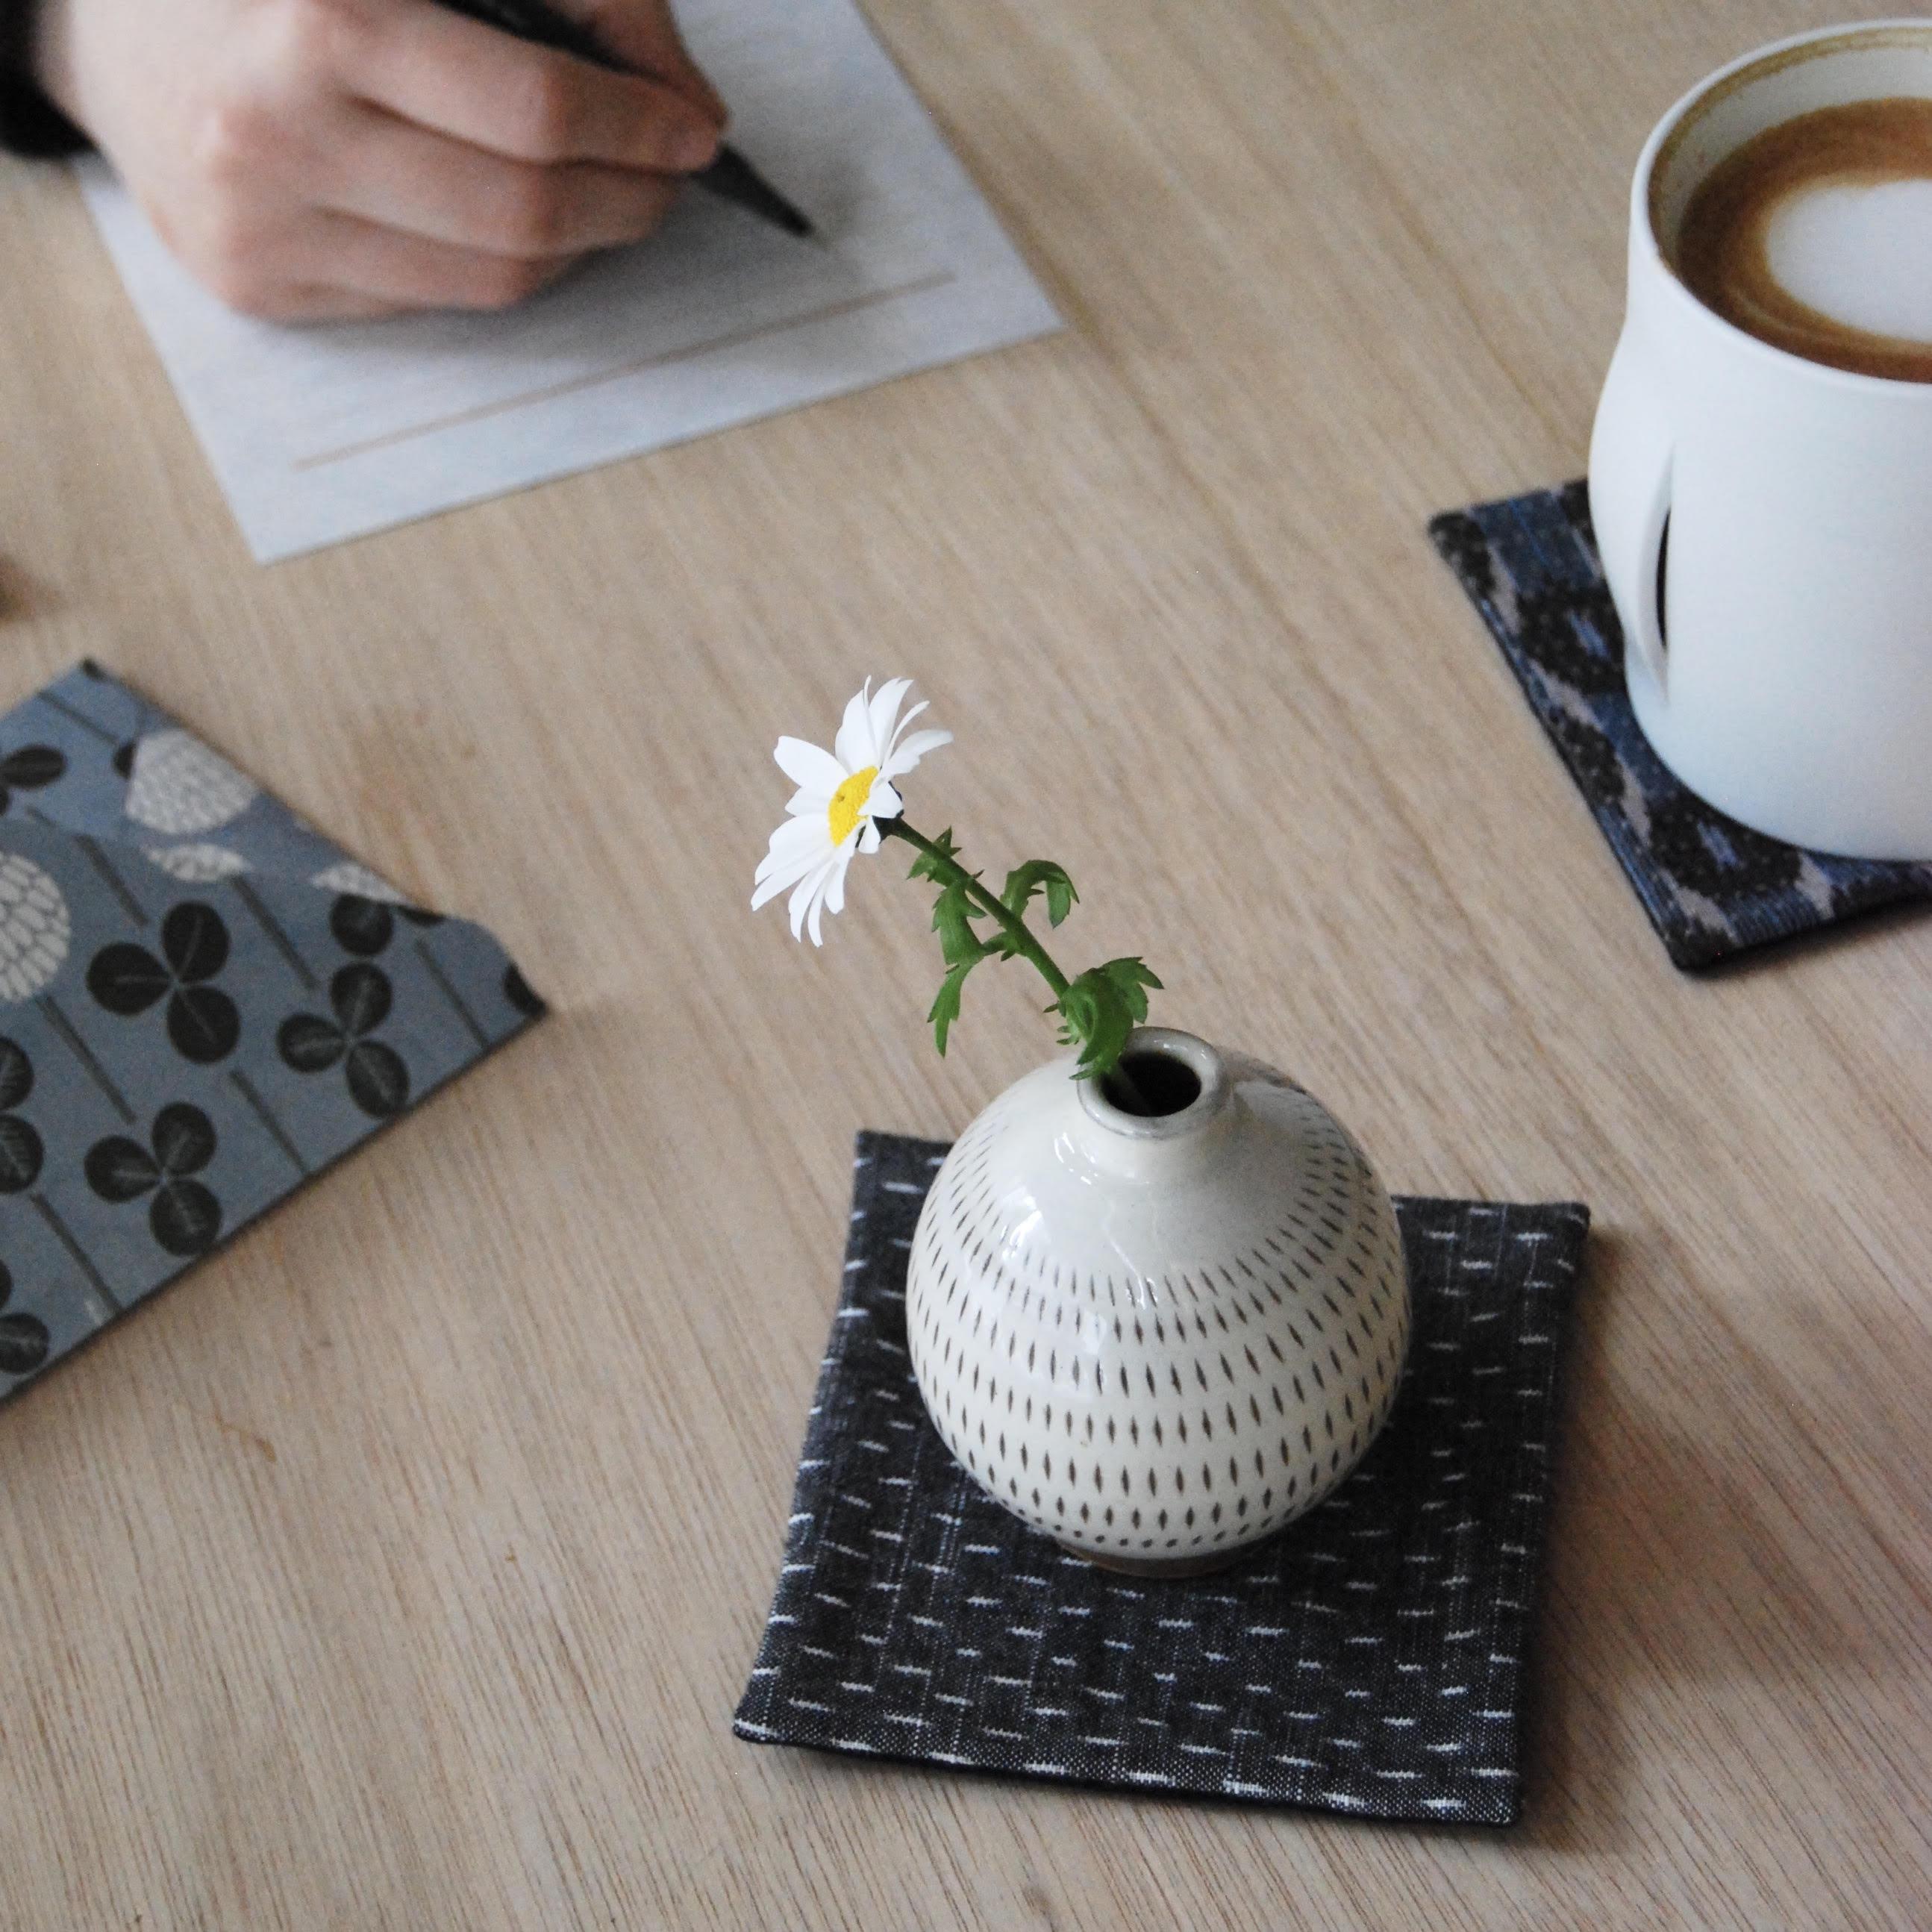 Ruska Cafe and Scones オリジナル「久留米絣」の商品を販売開始しました